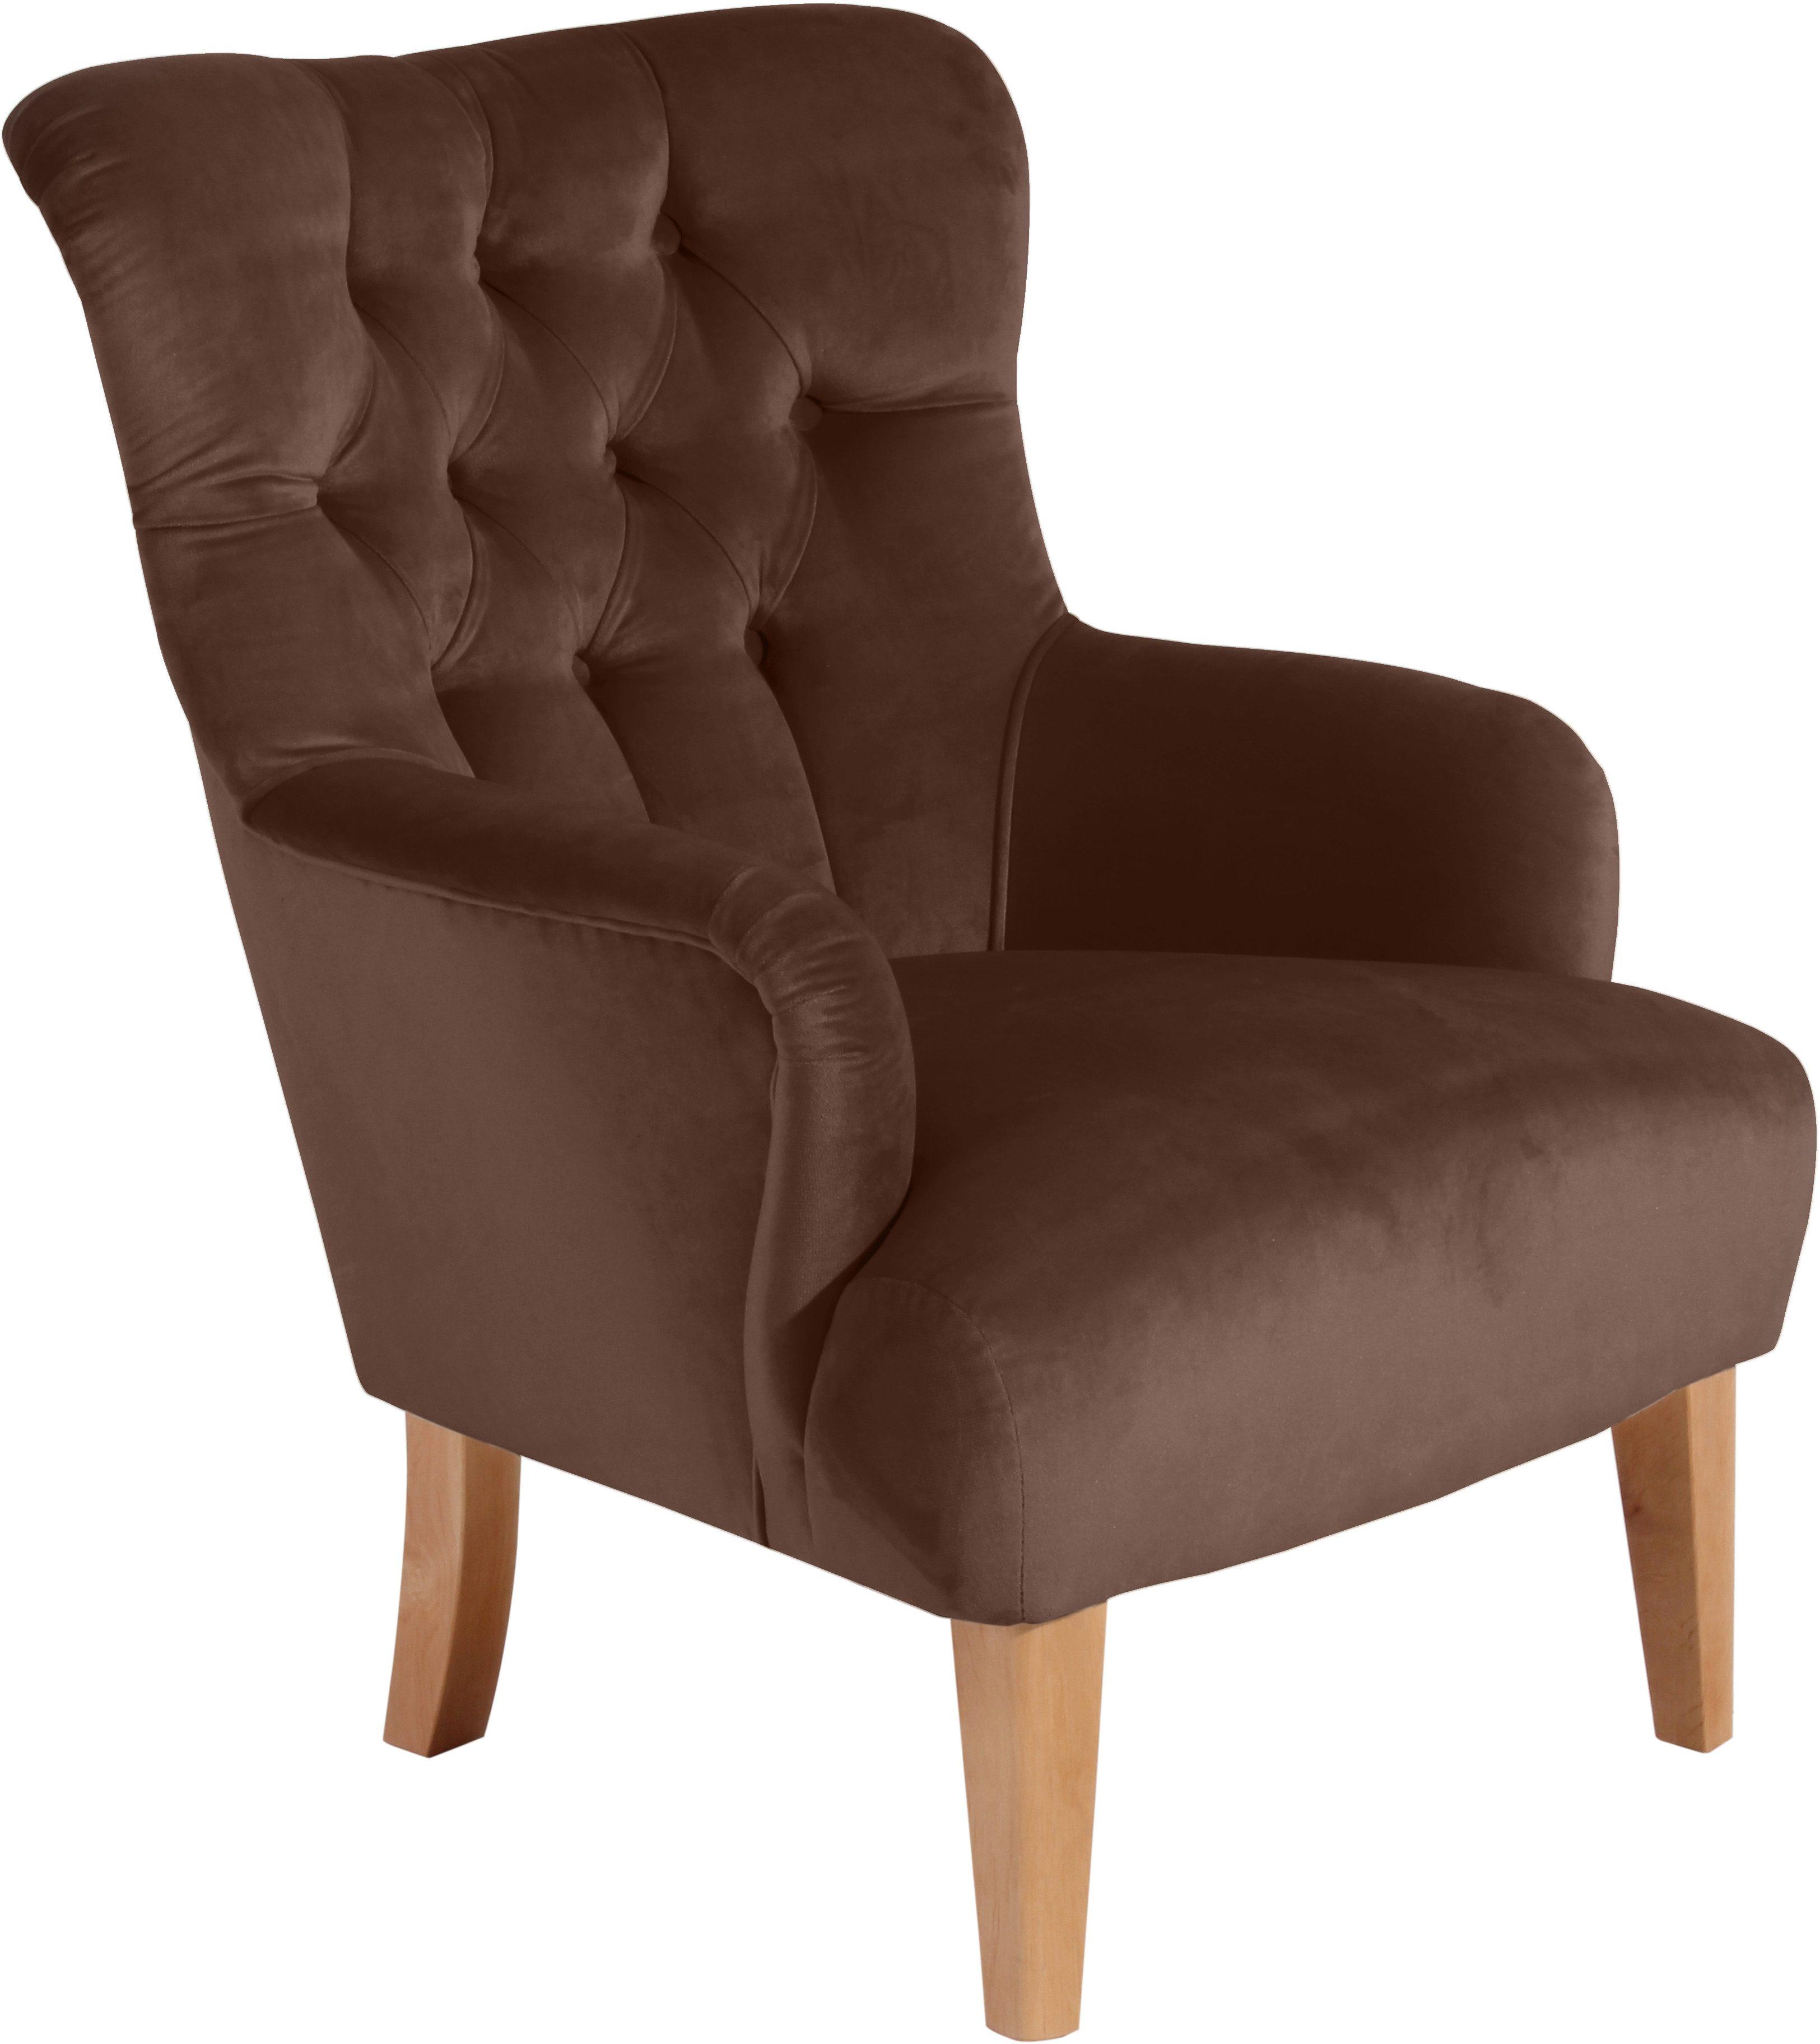 Max Winzer® Chesterfield-Sessel »Bradley« | Wohnzimmer > Sessel > Chesterfield Sessel | Braun | Buche | MAX WINZER